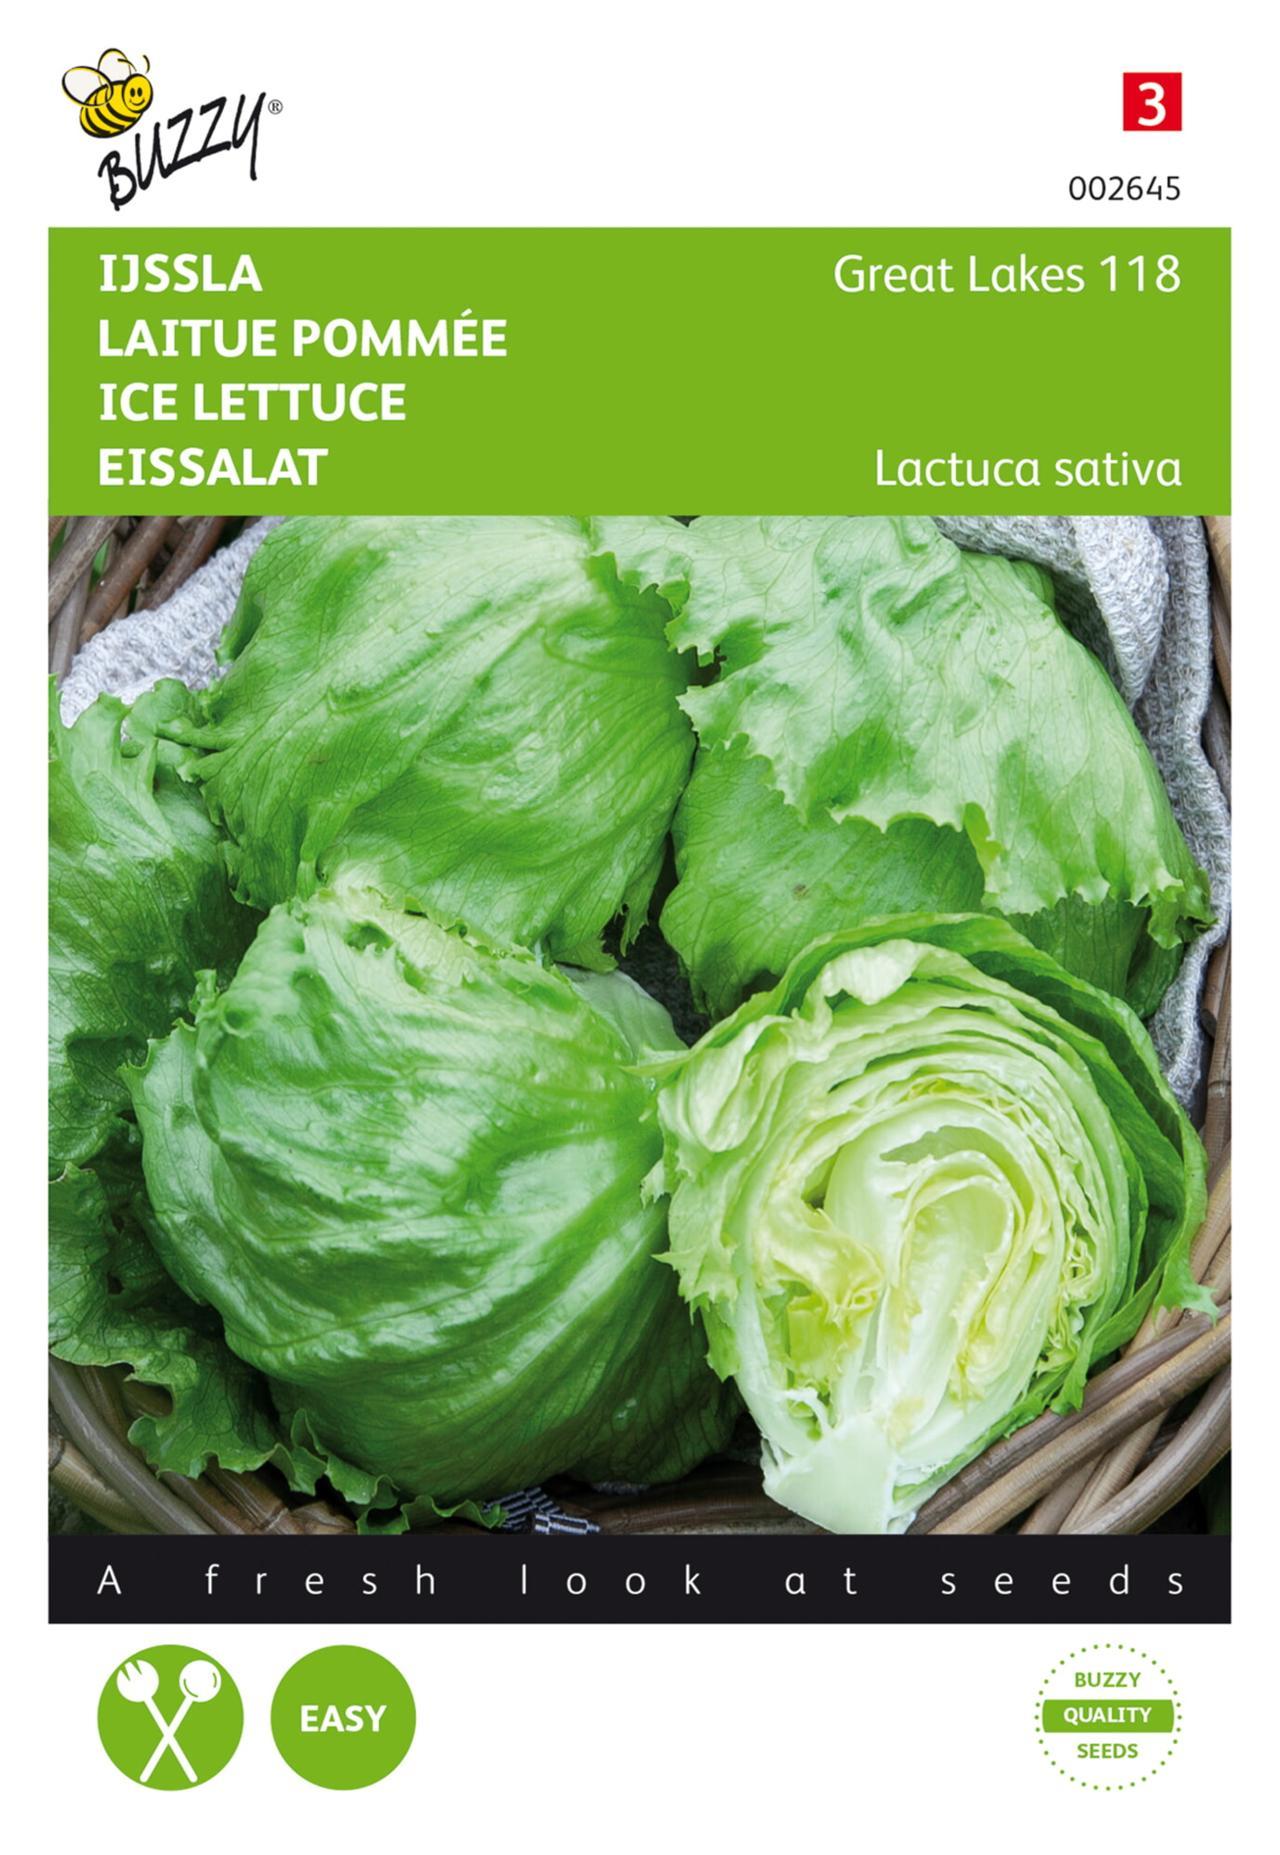 Lactuca sativa 'Great Lakes 118' plant